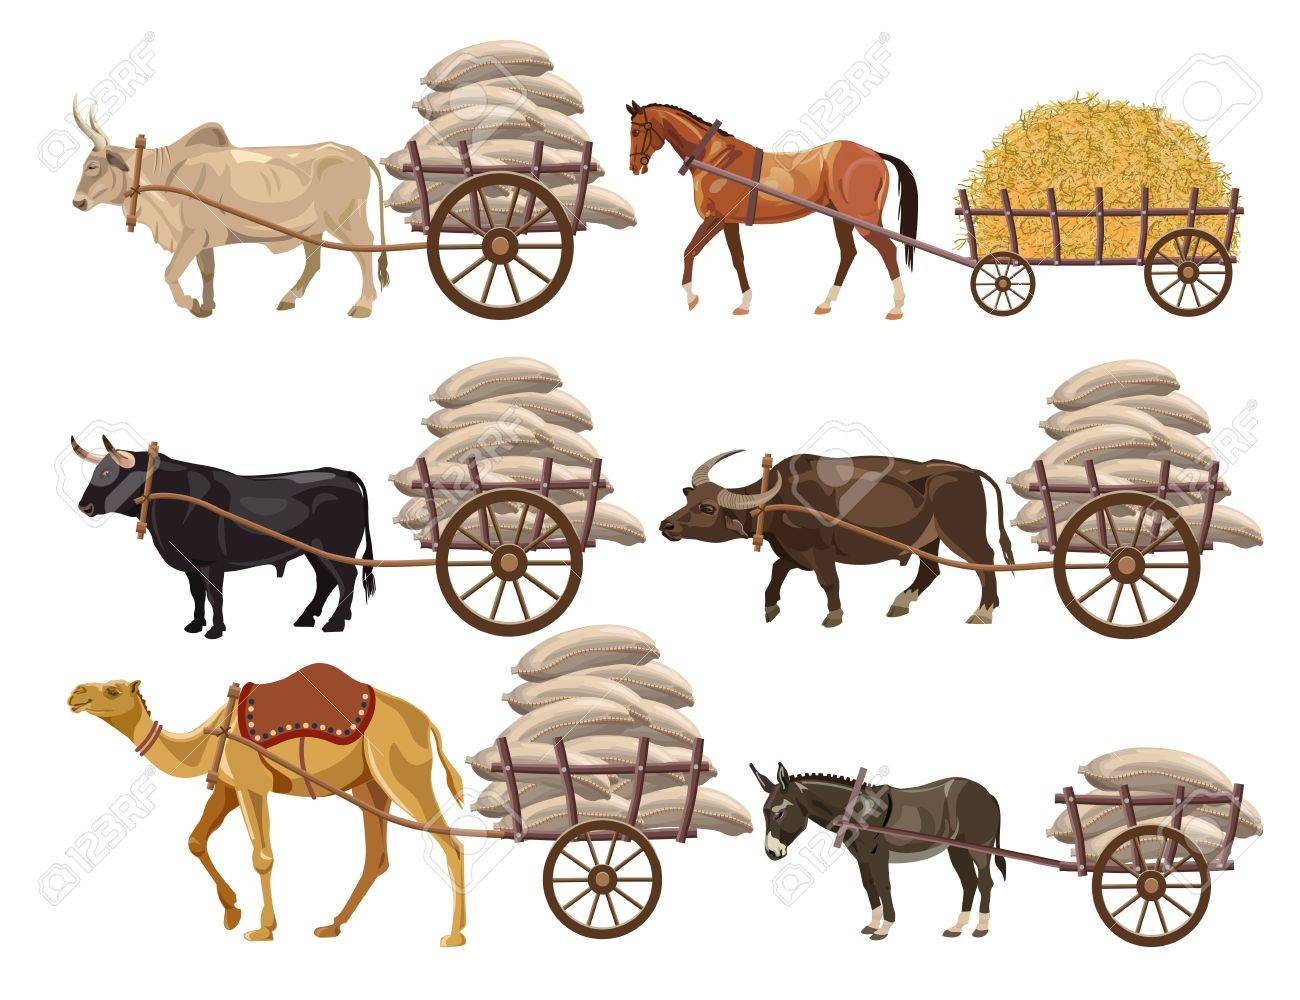 jpg library stock Free cart download clip. Carts clipart buffalo.